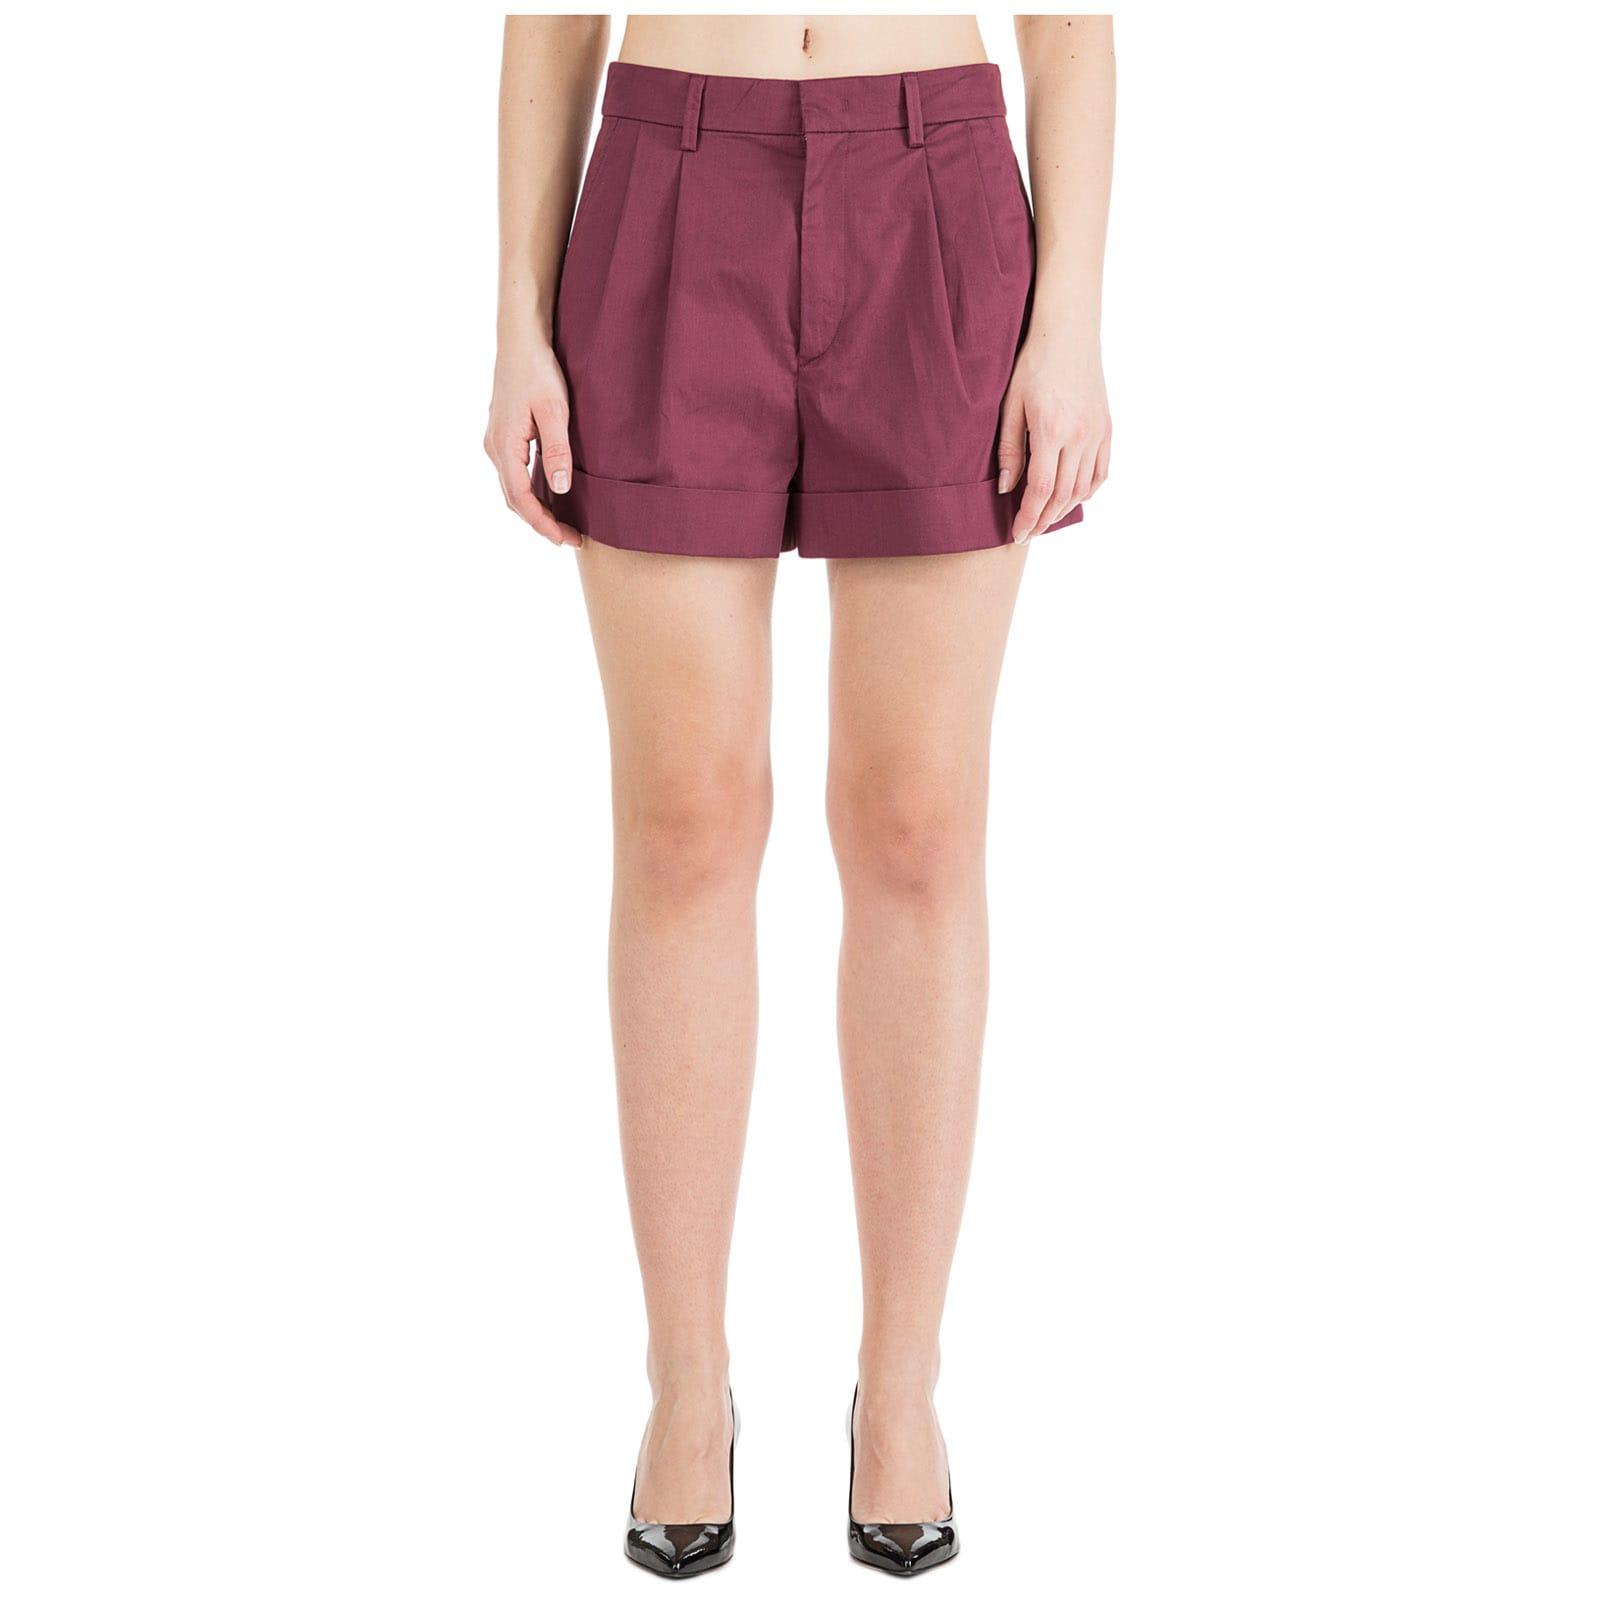 64d08bdb11 Isabel Marant Pantaloncini Corti Shorts Donn Woman Bermuda